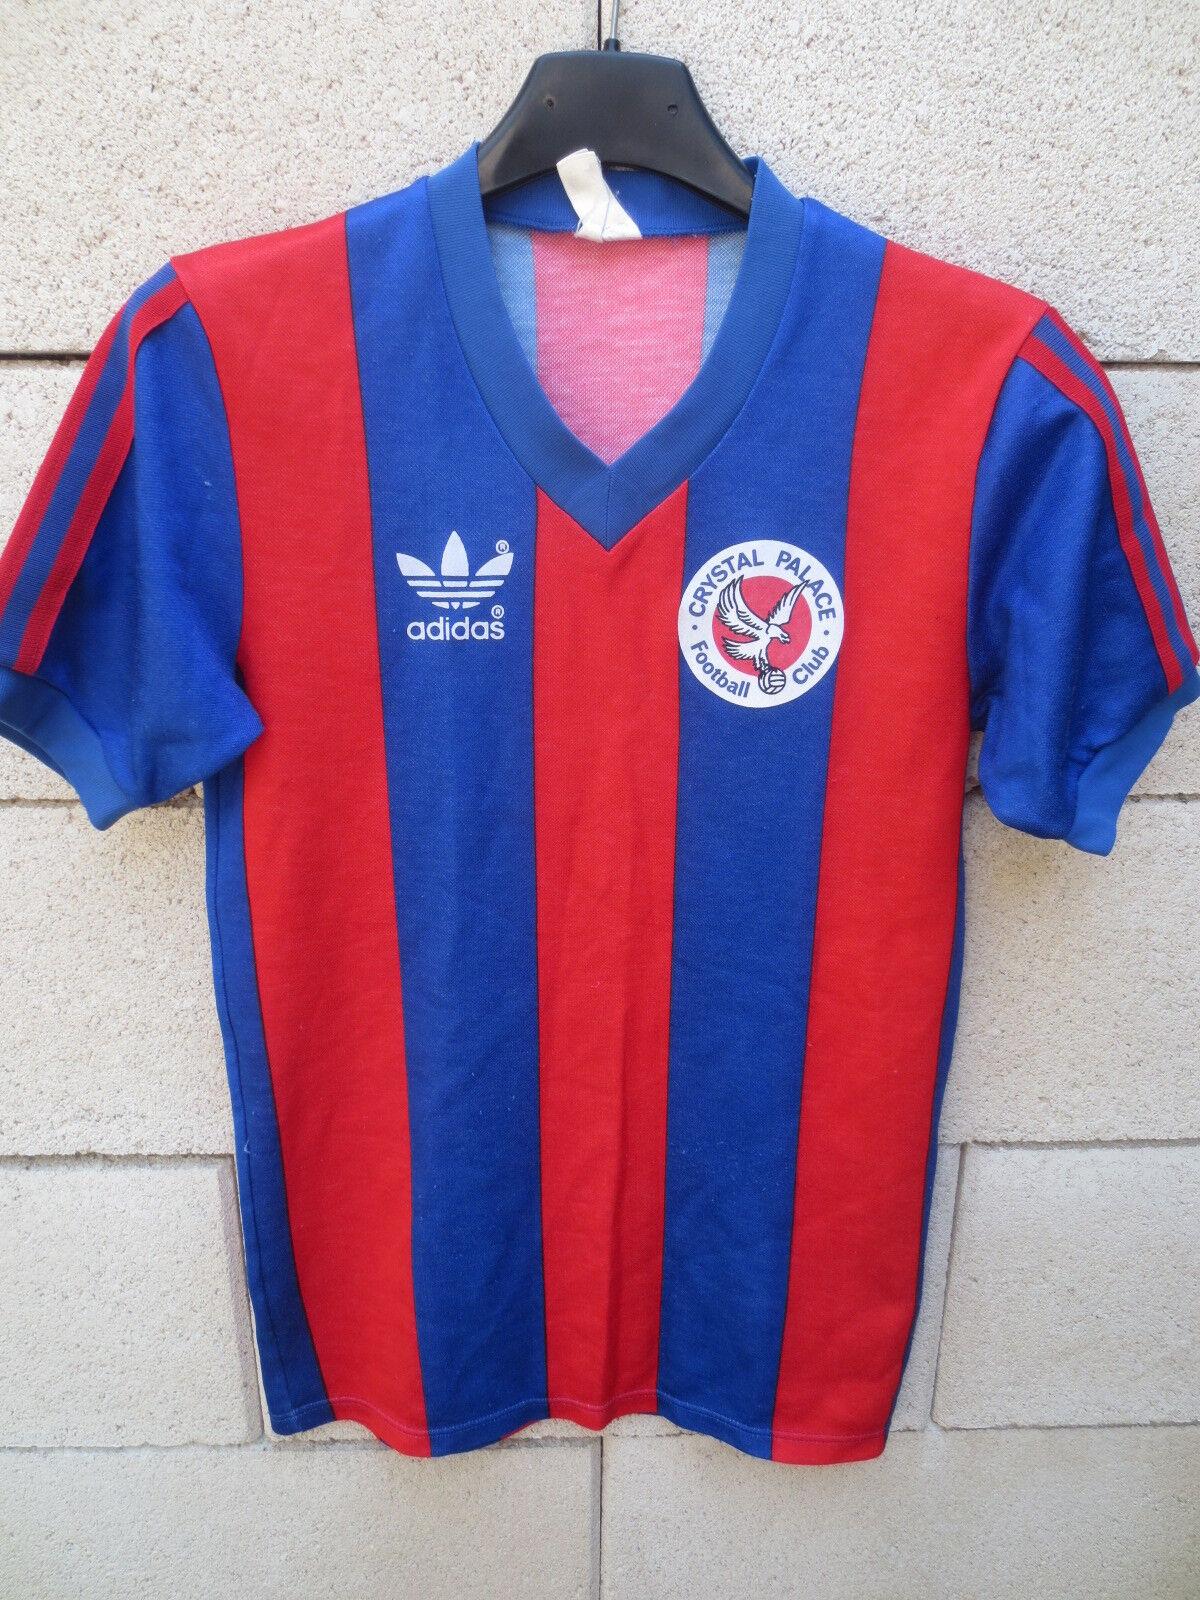 Maillot CRYSTAL PALACE vintage ADIDAS shirt rare football oldschool 12 14 ans